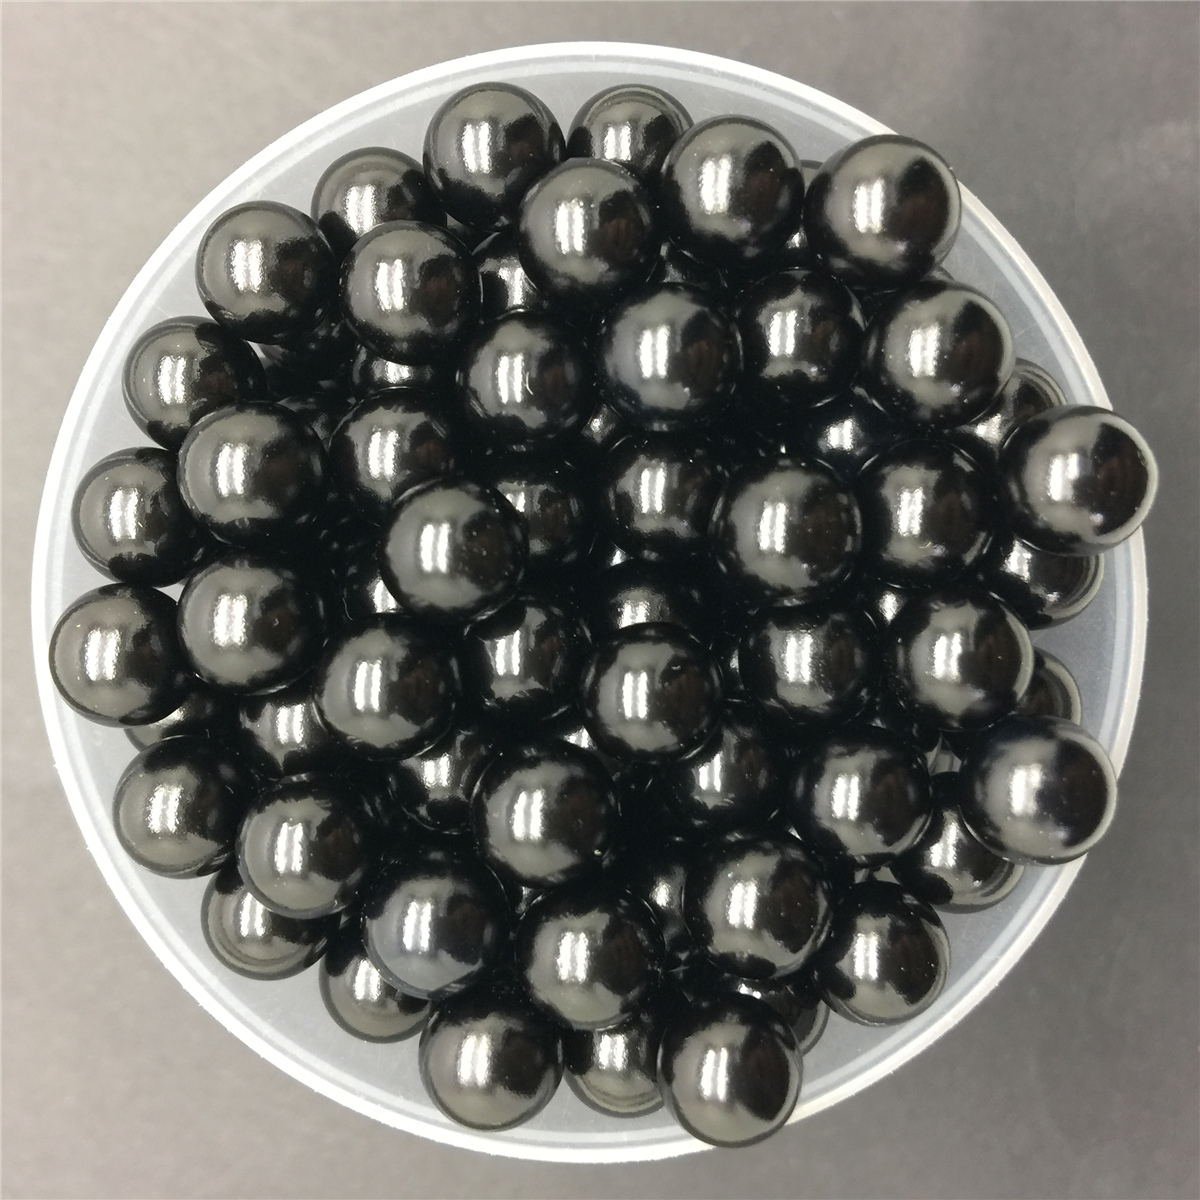 NEW DIY 6mm 100PCS Creamy Acrylic No Hole Round Pearl Loose Beads Jewelry Making